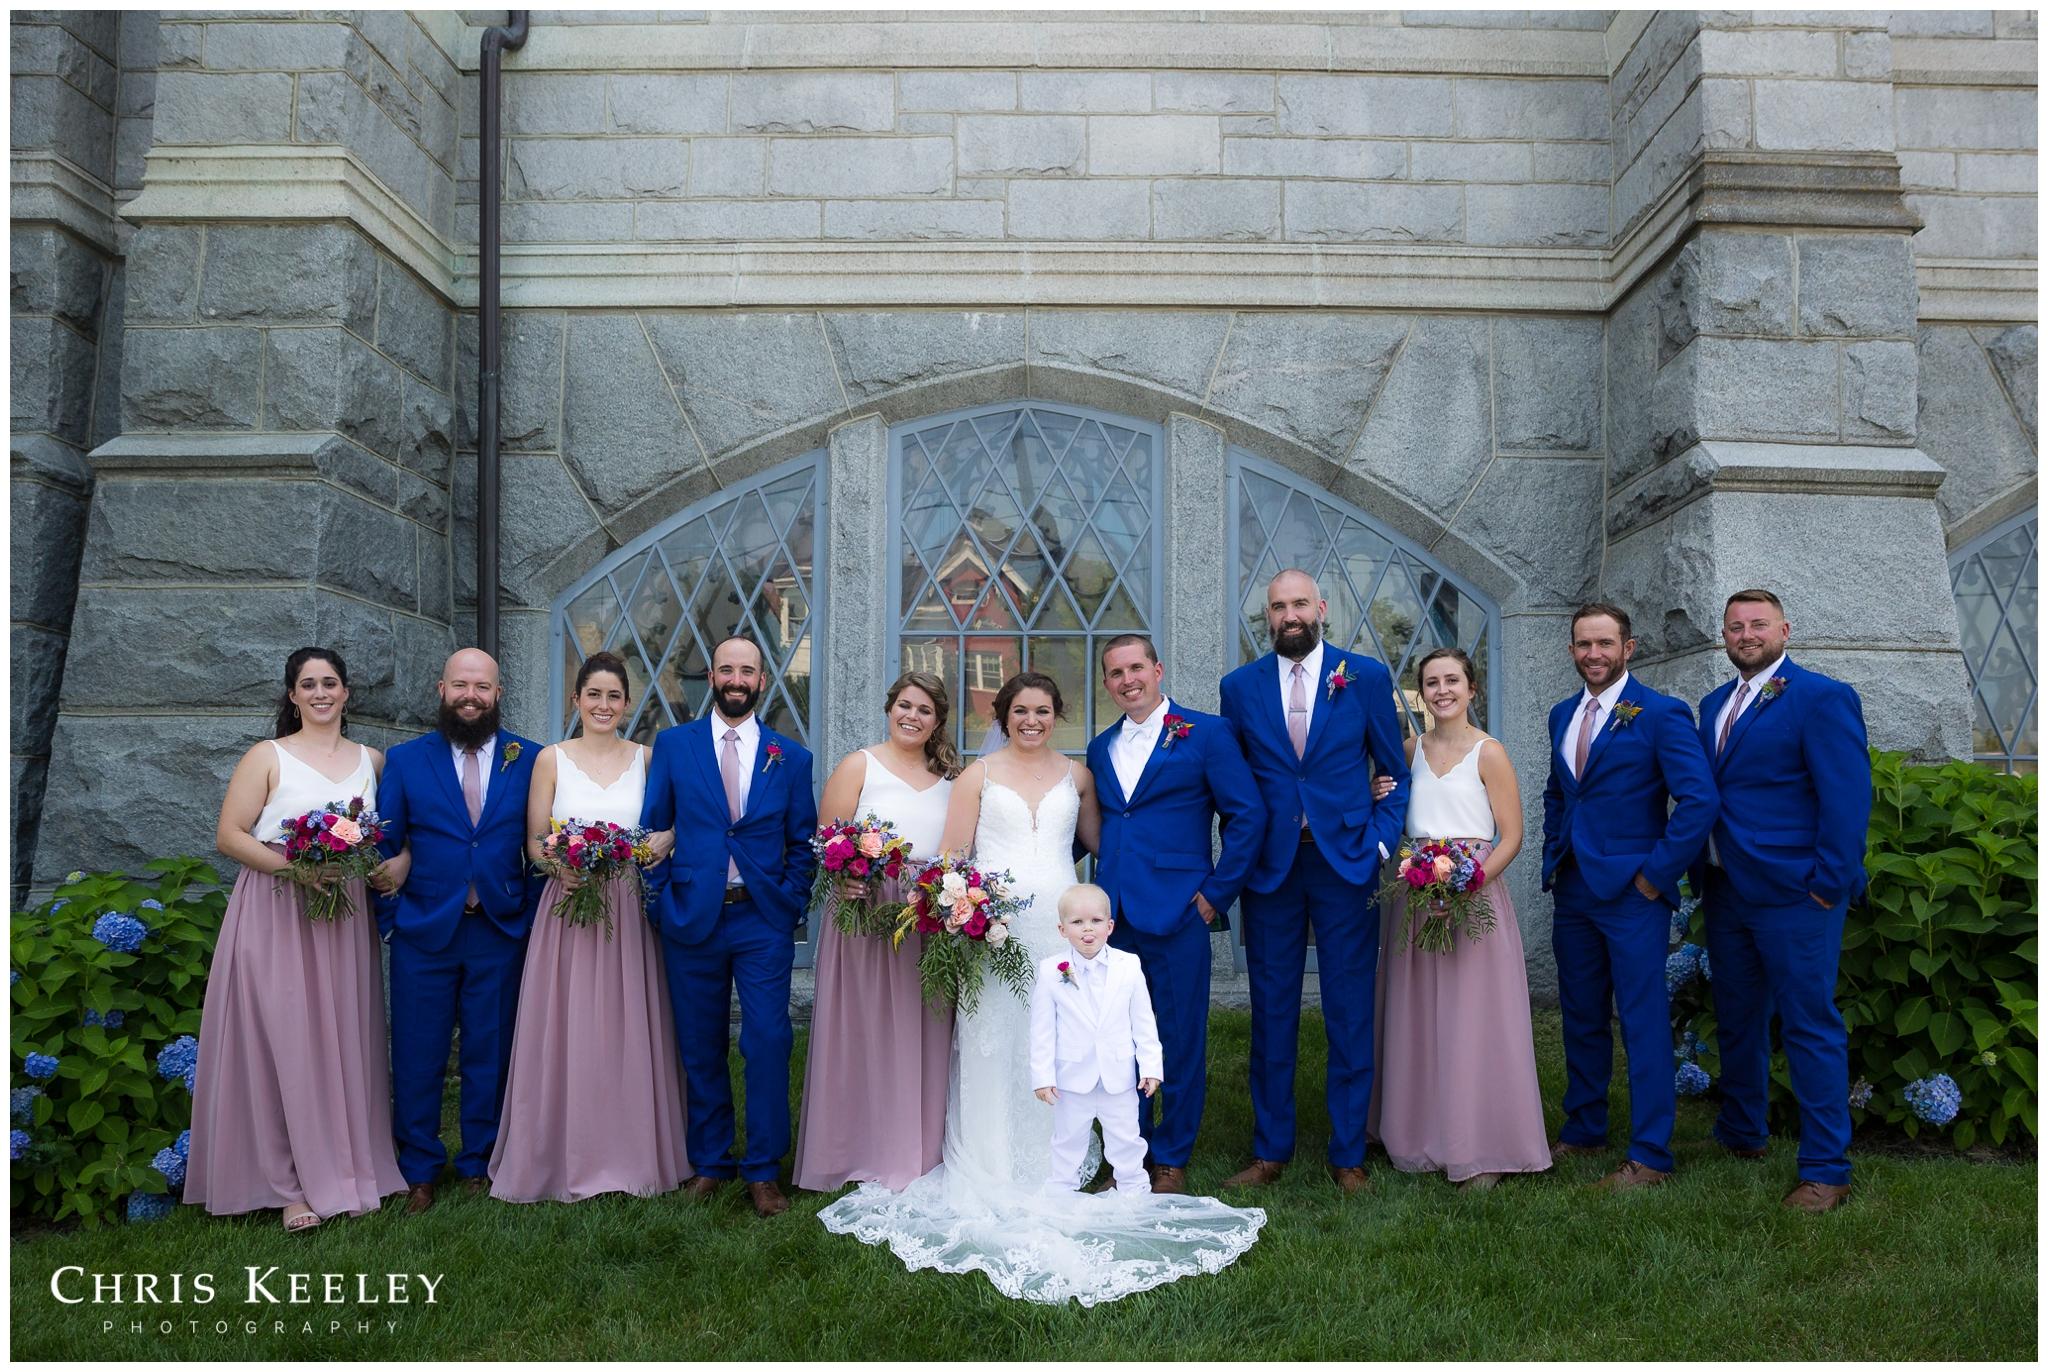 wedding-party-outside-church.jpg